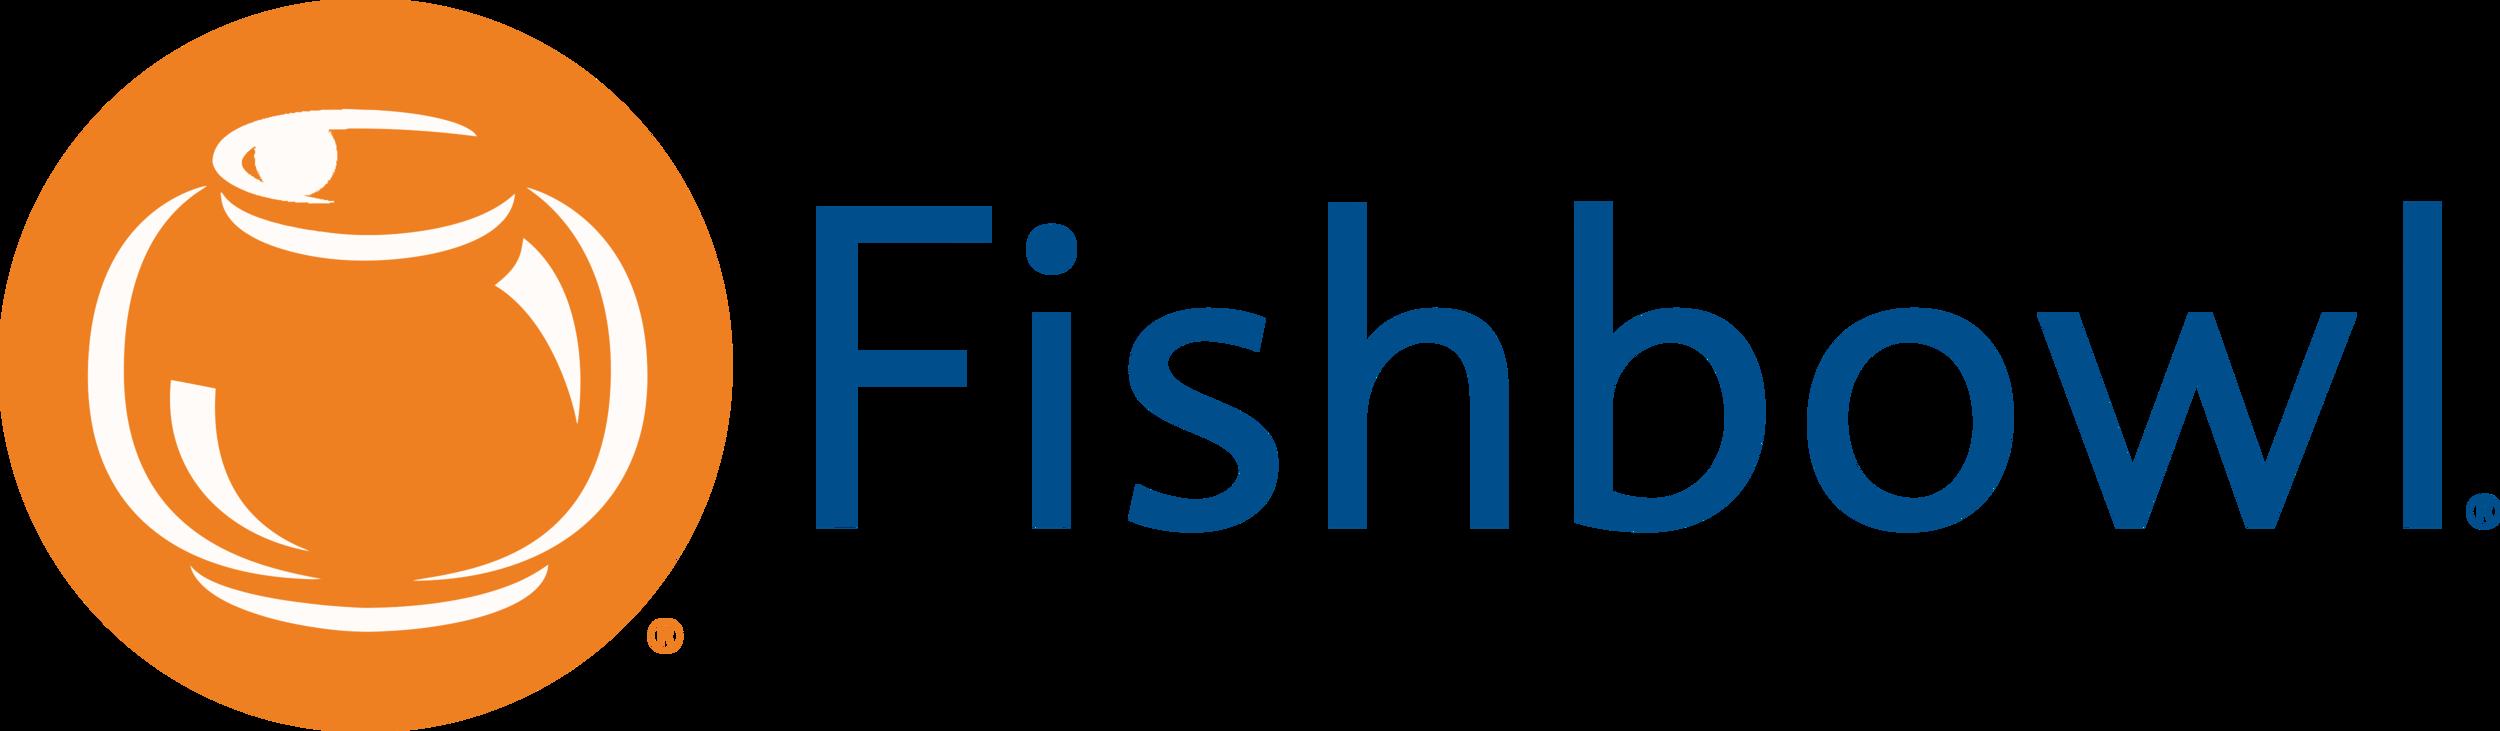 Fishbowl_Marketing_Logo.png